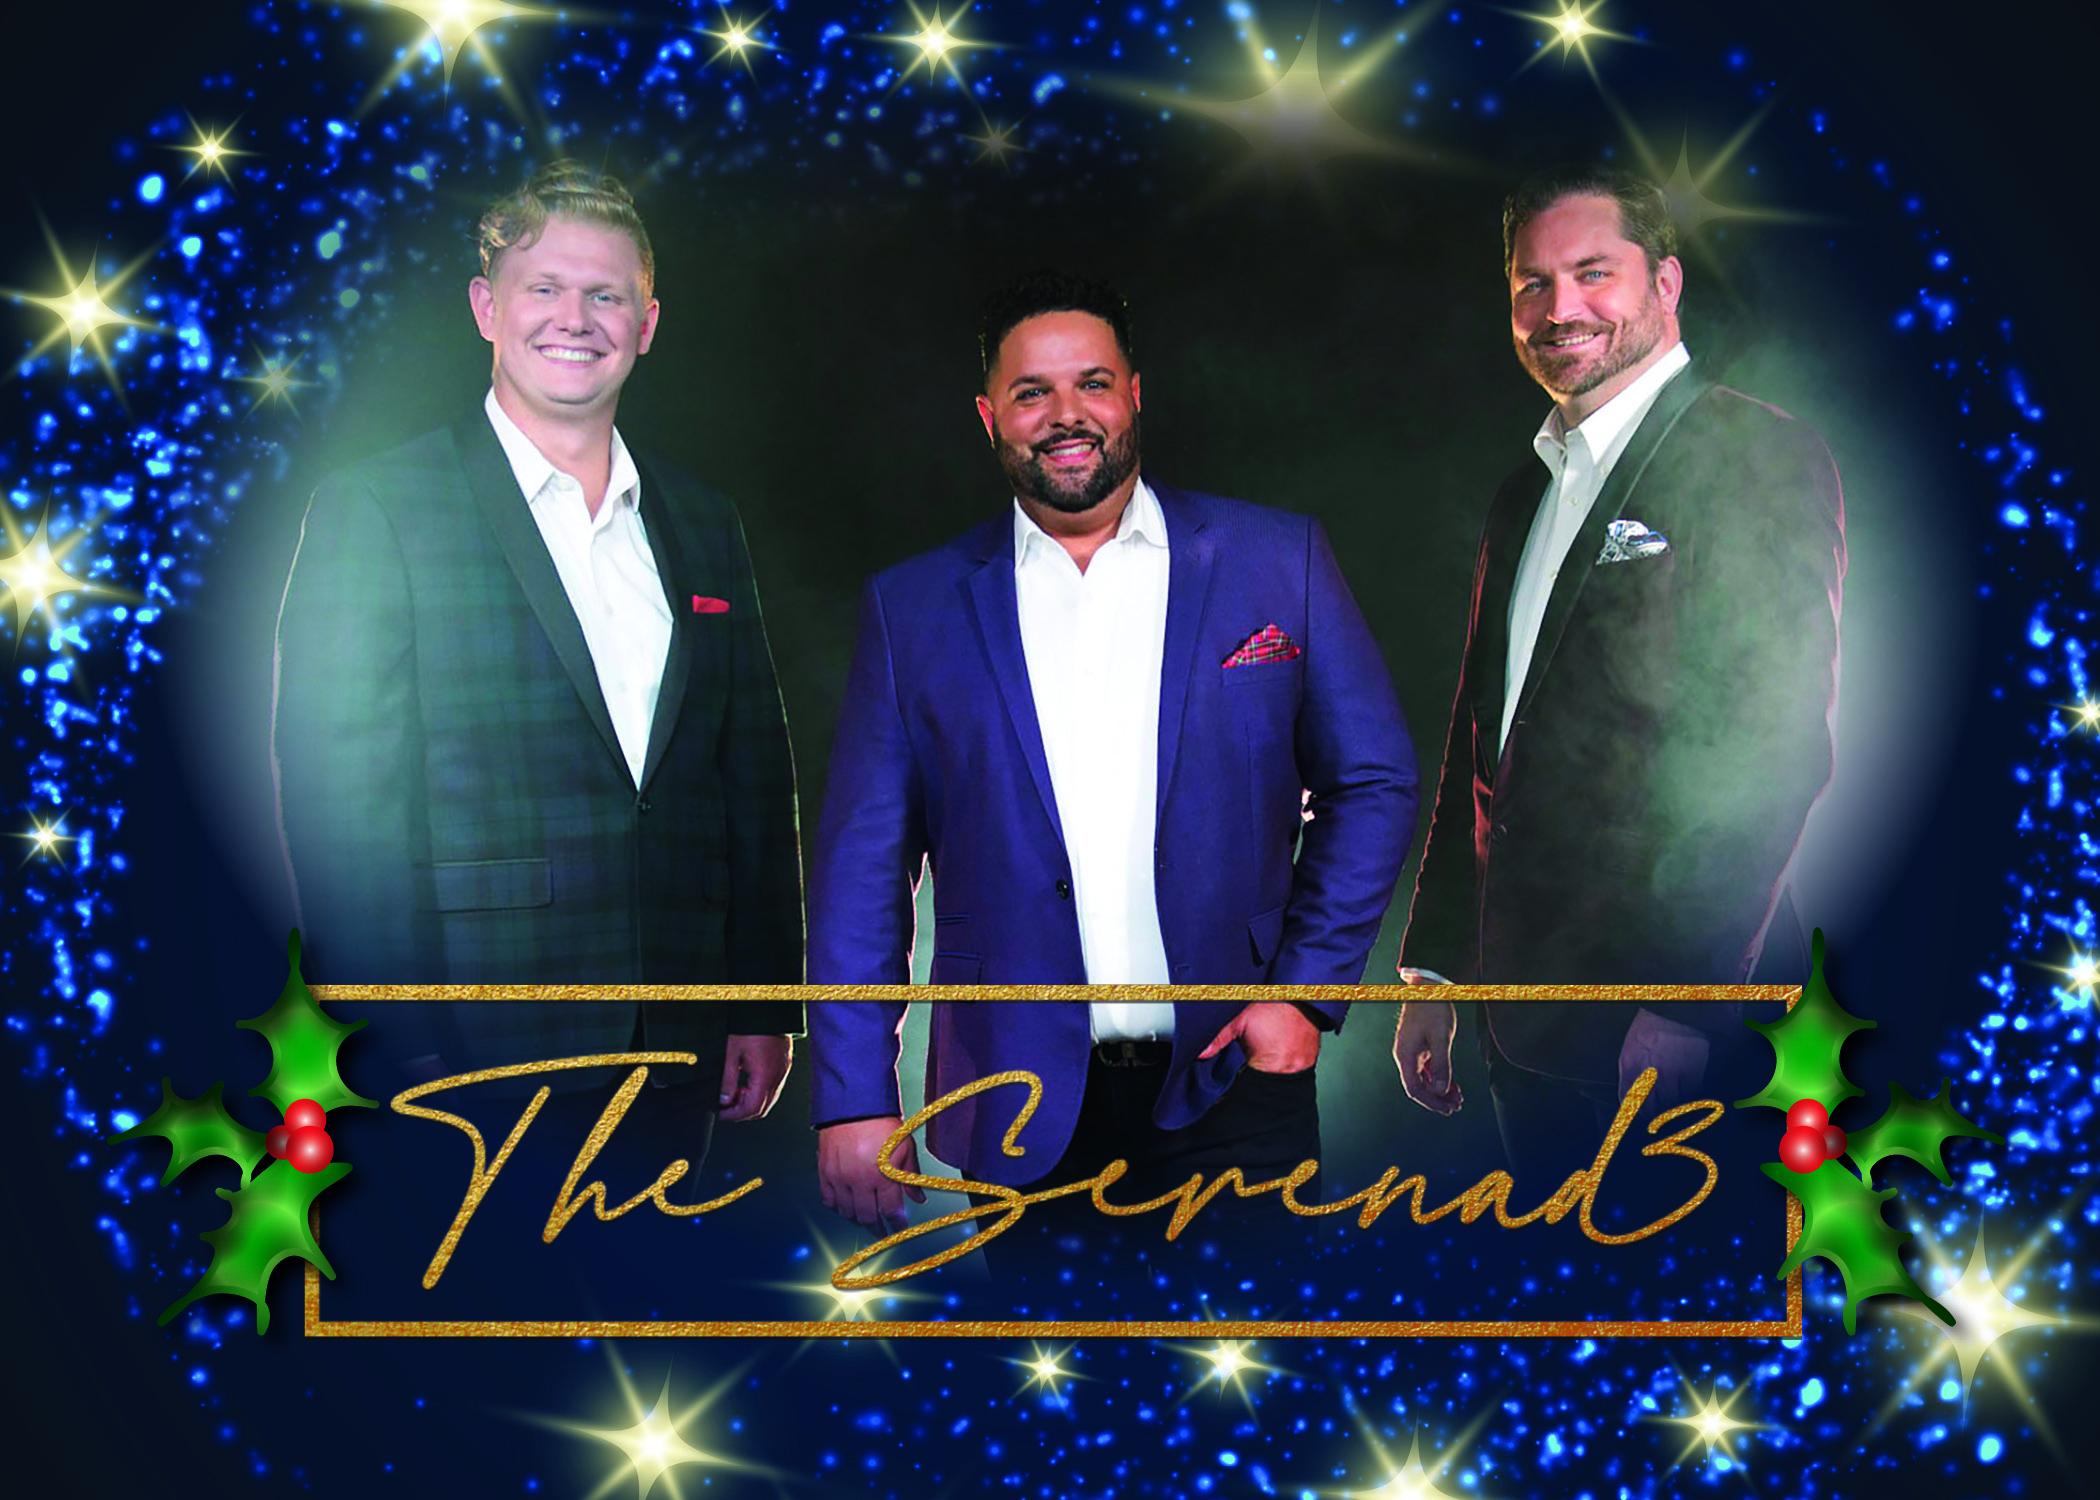 The Serenad3